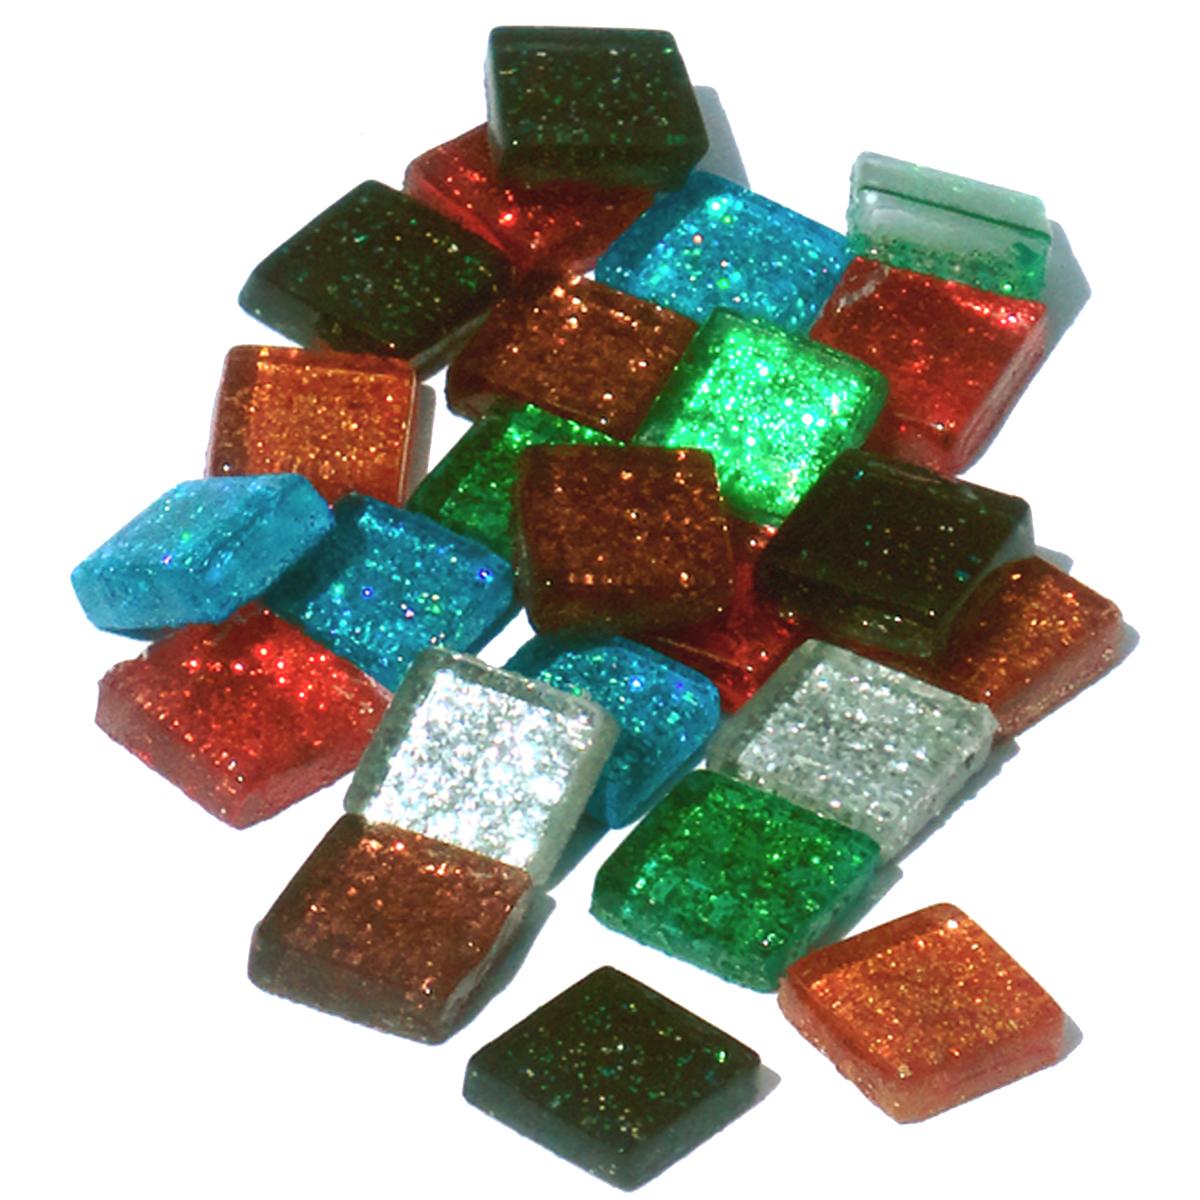 Mosaic mercantile vitreous glass mosaic tile joann mosaic mercantile vitreous glass mosaic tile dailygadgetfo Gallery